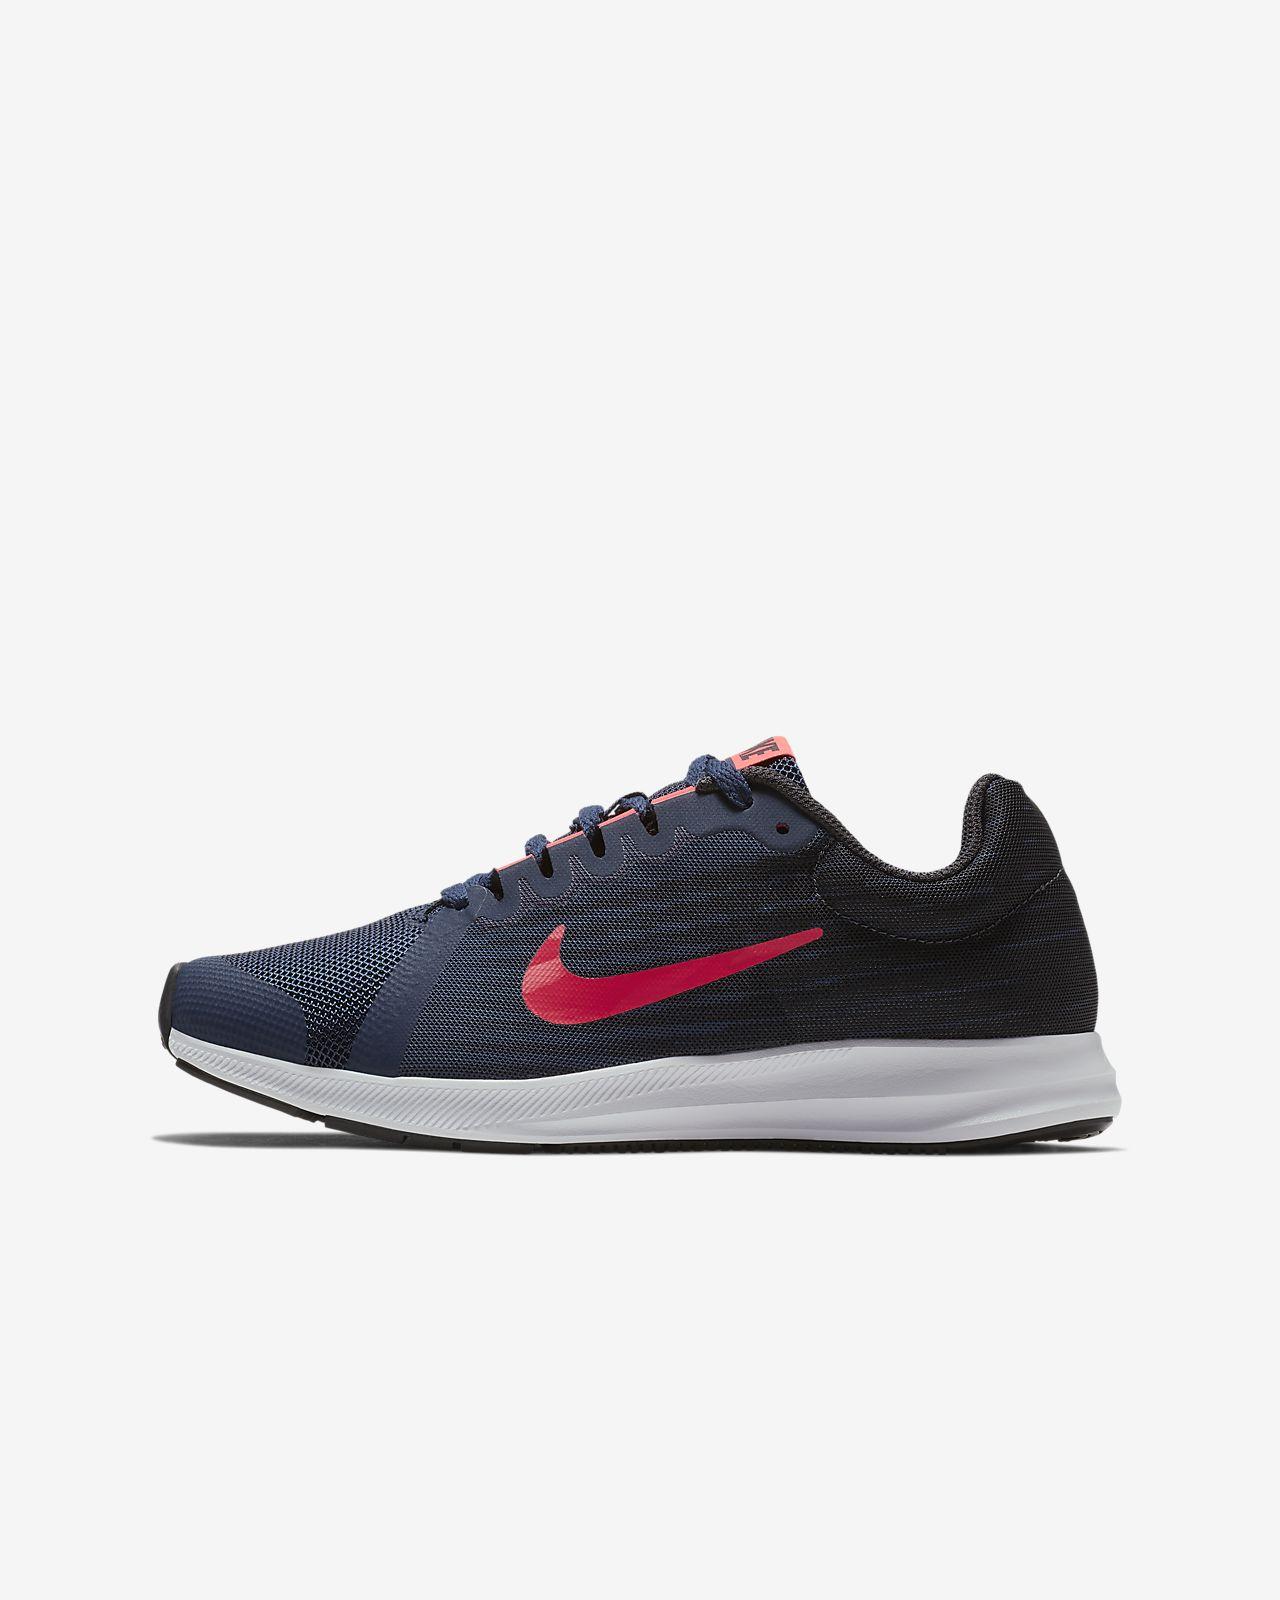 891a4a309c0b3 Nike Downshifter 8 Older Kids  Running Shoe. Nike.com IN